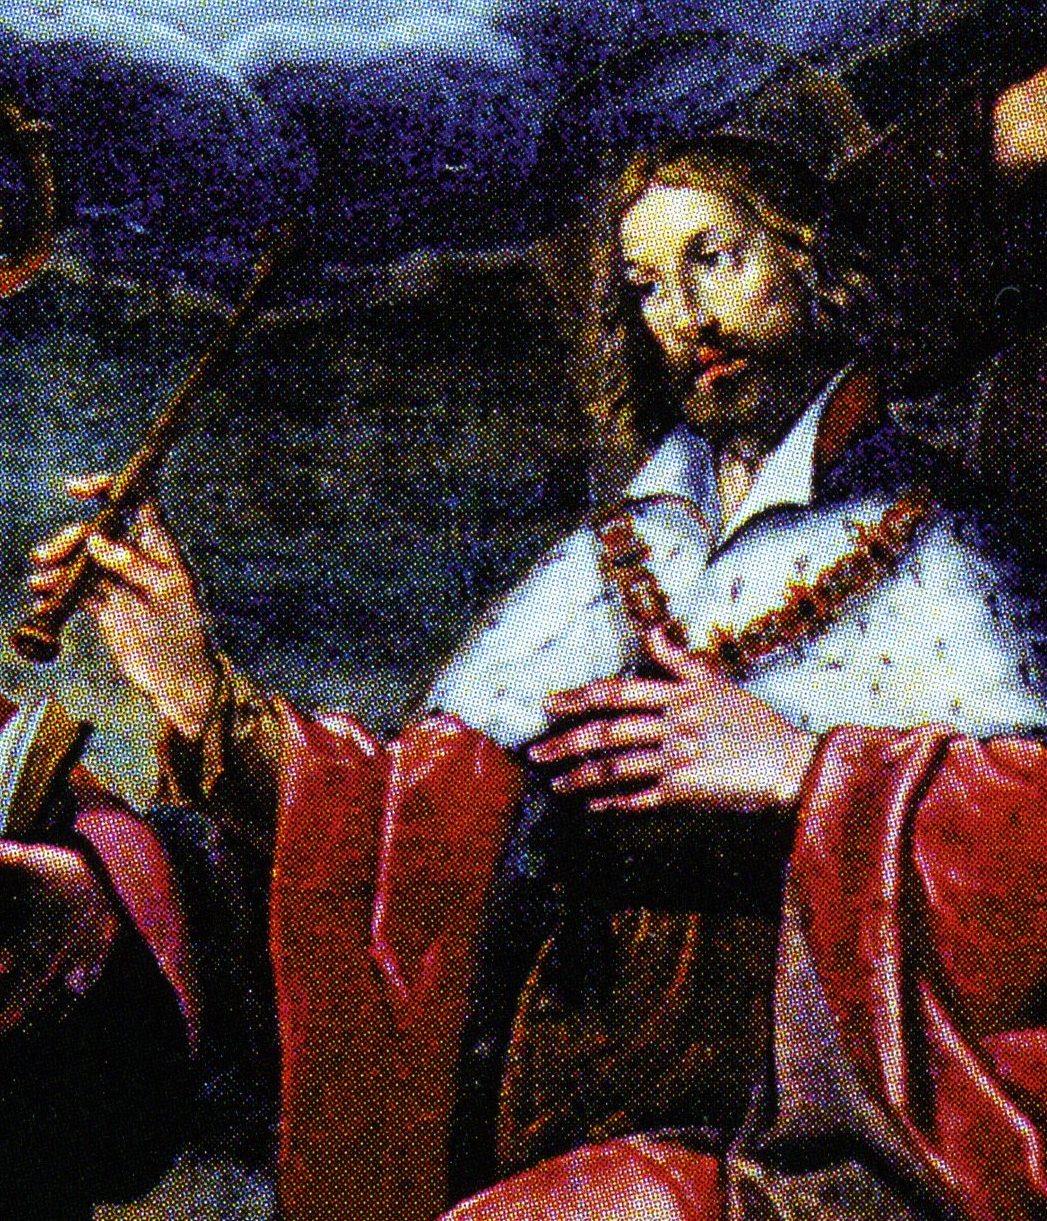 Francesco Maria II della Rovere